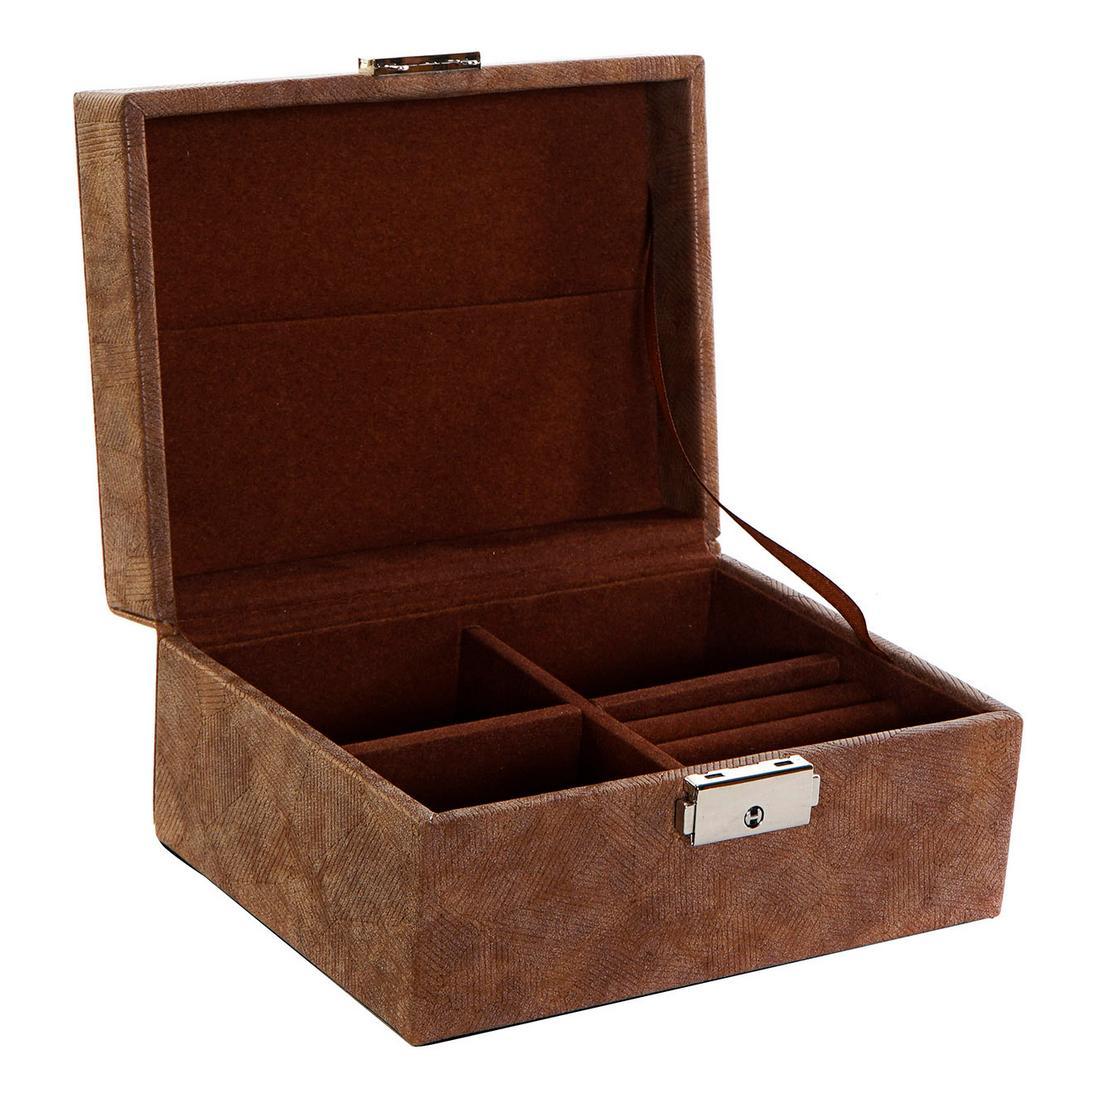 Jewelry box DKD Home Decor Polyurethane Vintage MDF Wood (17 x 13 x 8.5 cm)